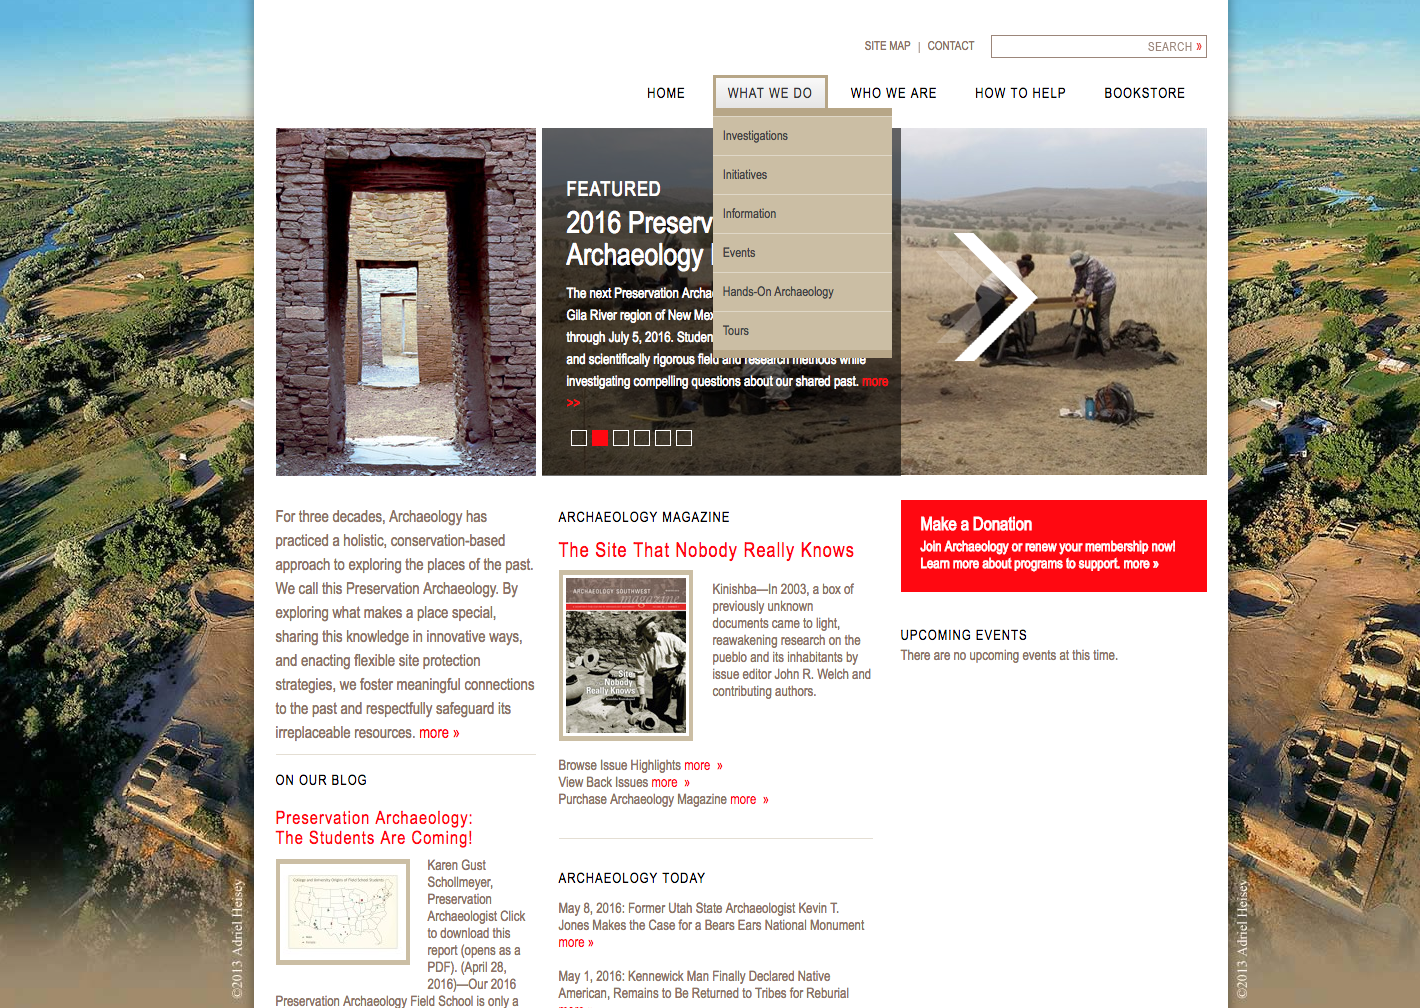 Design A Better Website: Foundations First - Image 2